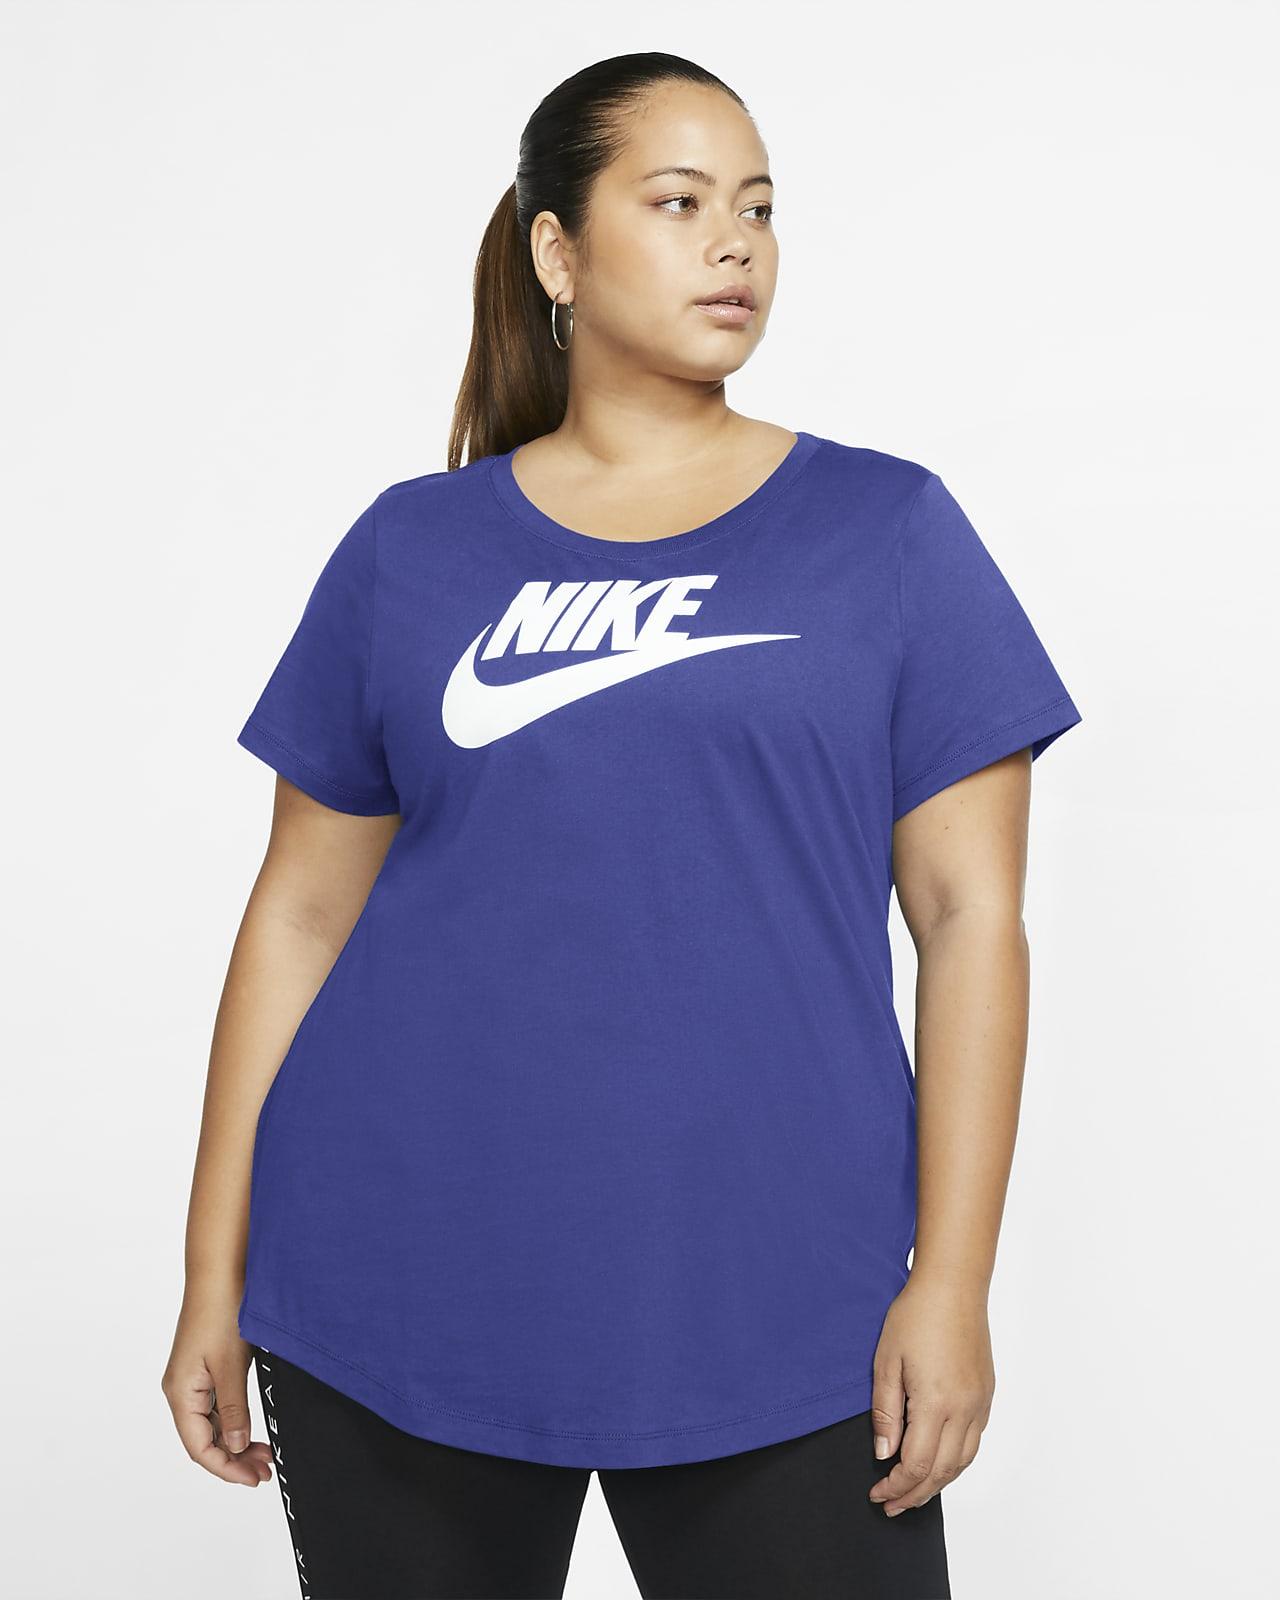 Playera para mujer (talla grande) Nike Sportswear Essential